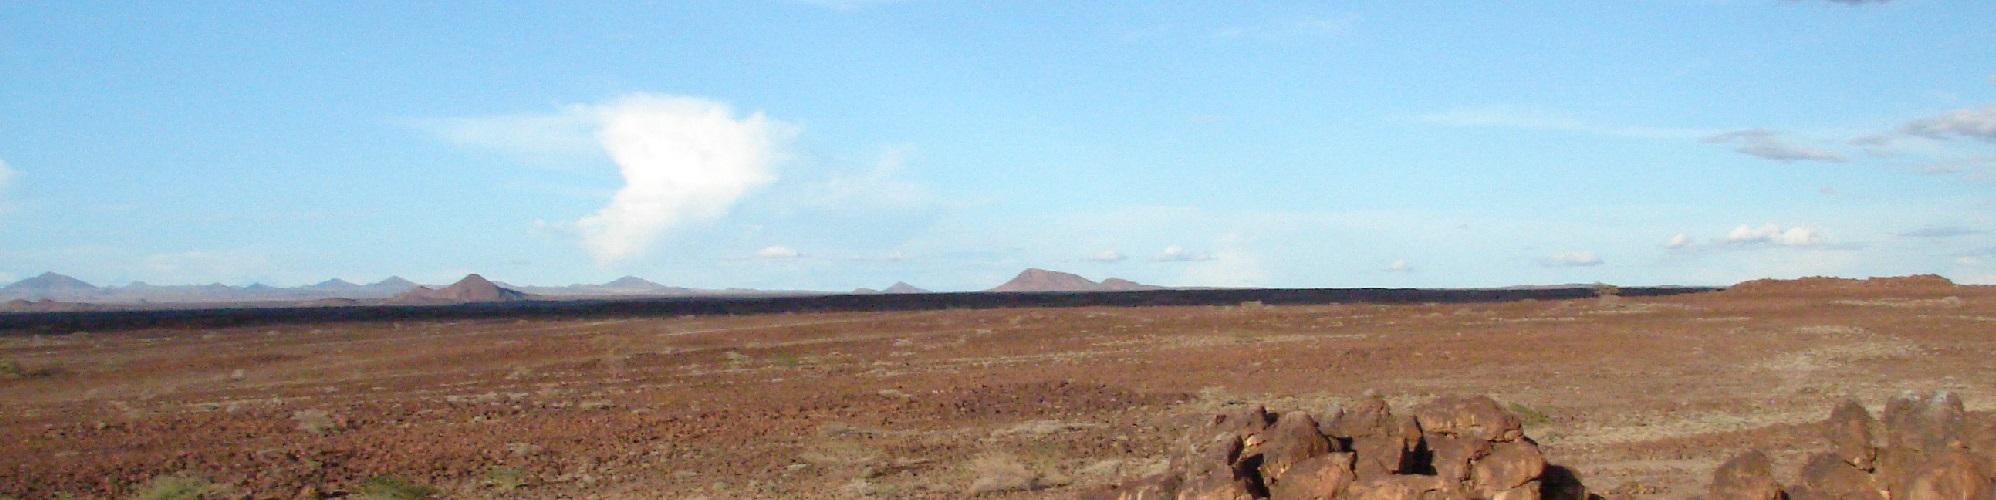 Landscape panorama ear Afkaba, Marsabit, Kenya